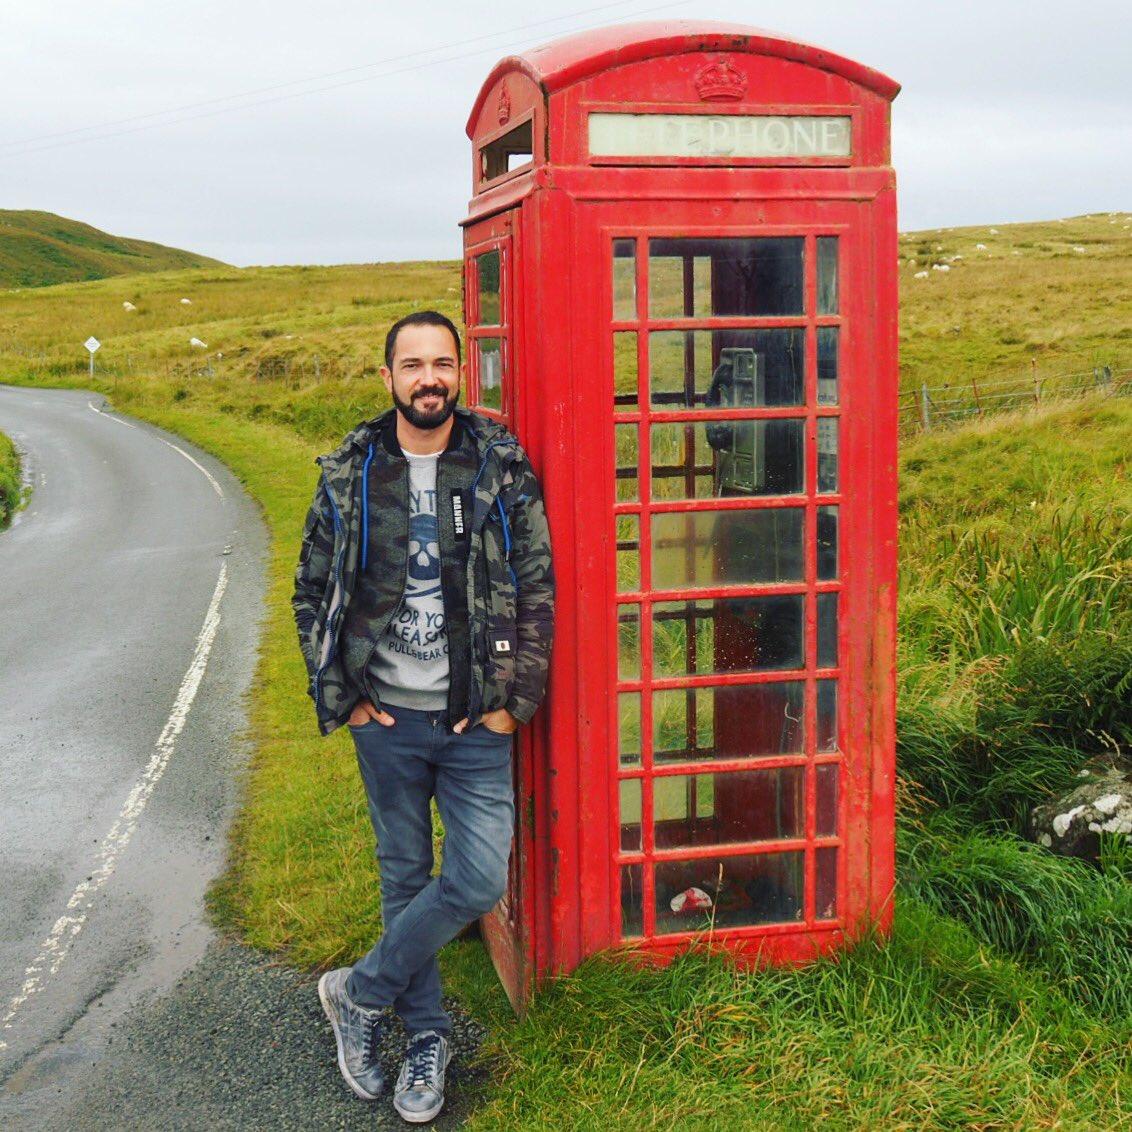 Callboys  . . . #skye #iledeskye #telephone #phone #red #scotland #ecosse #call #boy #ecosse #vacances #holidays #roadtrip<br>http://pic.twitter.com/wfEXDjAjQ6